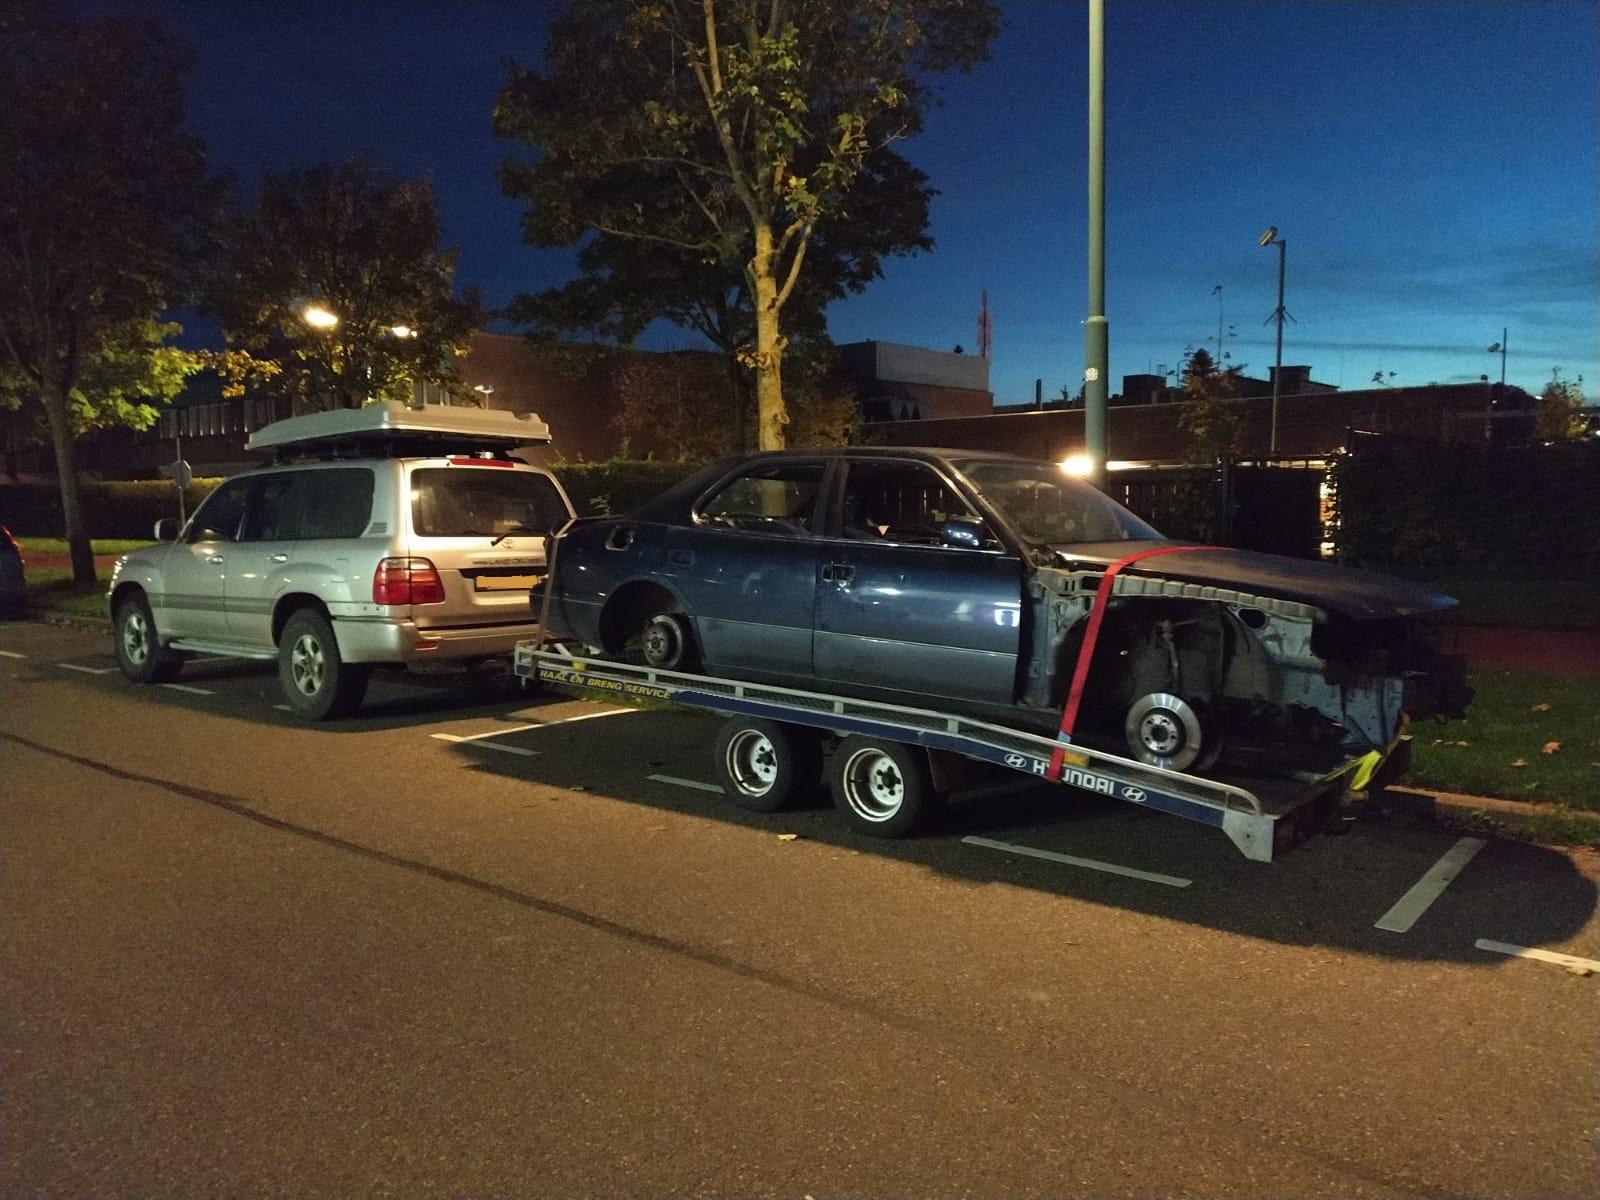 ls400 on trailer.jpeg